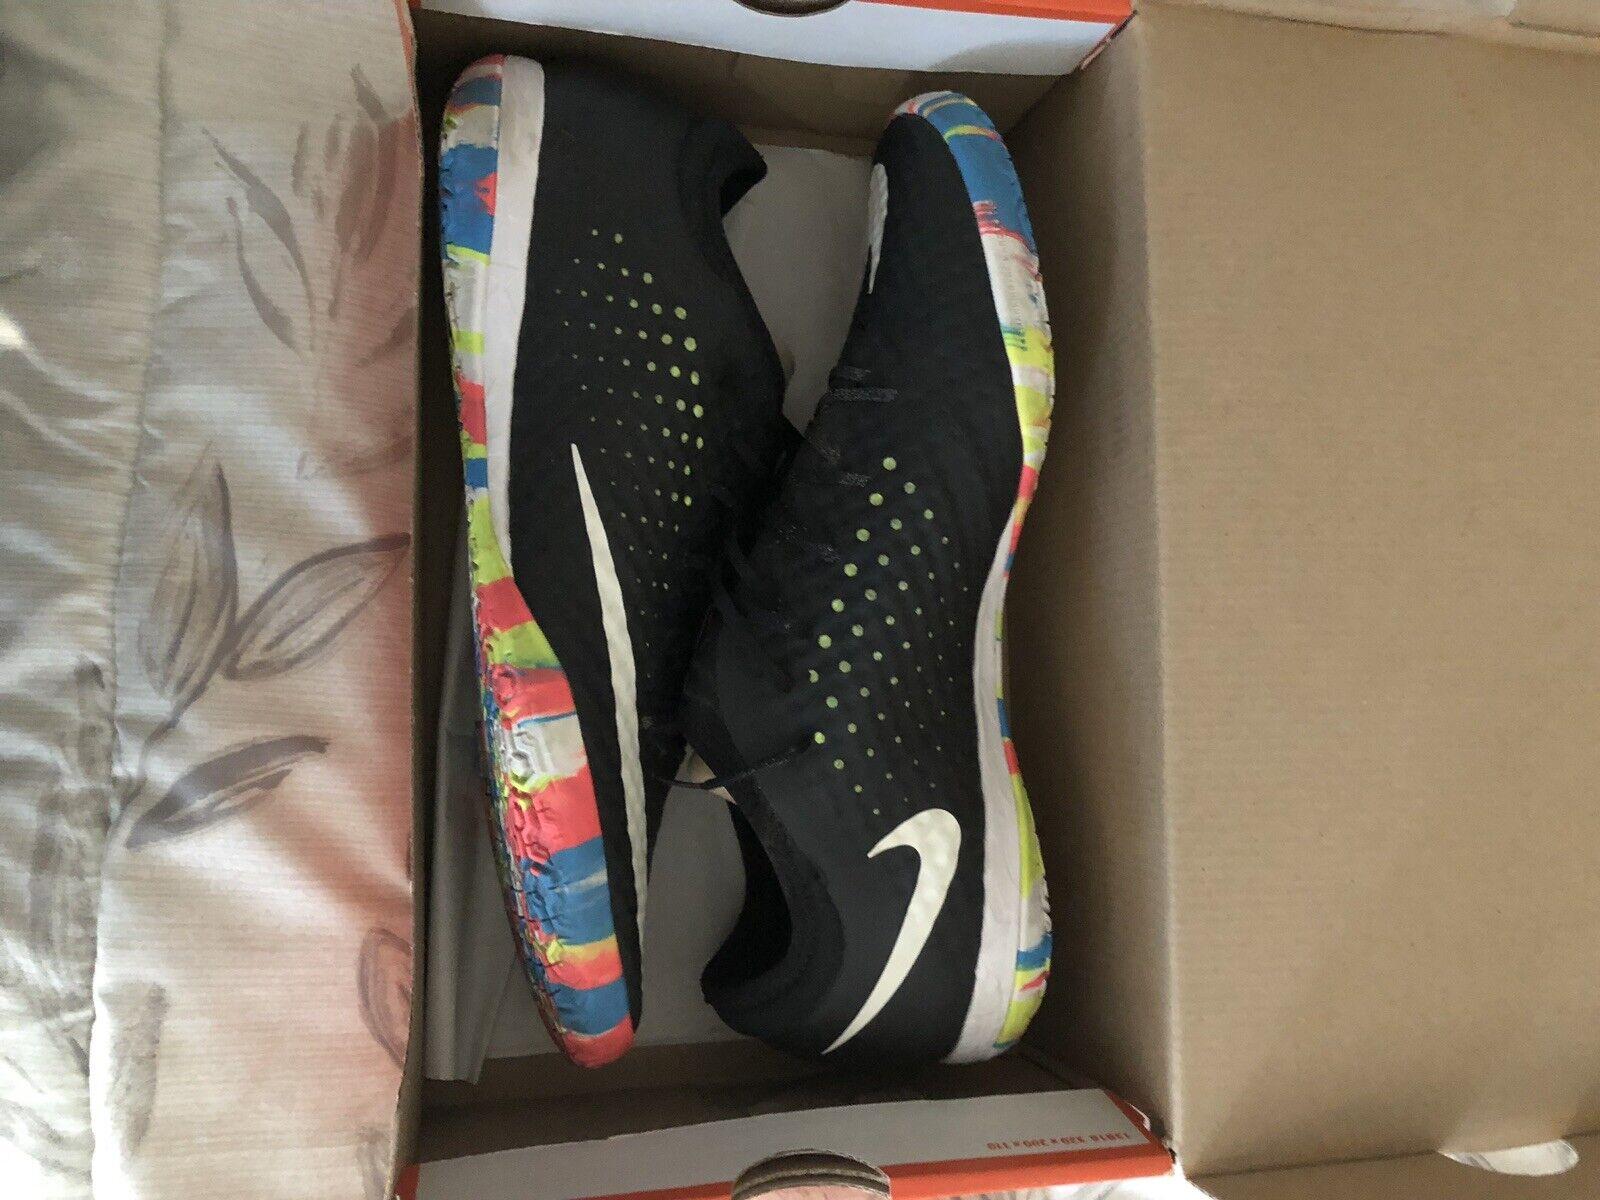 Nike Mercurial X Finale Street IC Calzado de Fútbol Indoor Talla 11 (725246-017) Raras